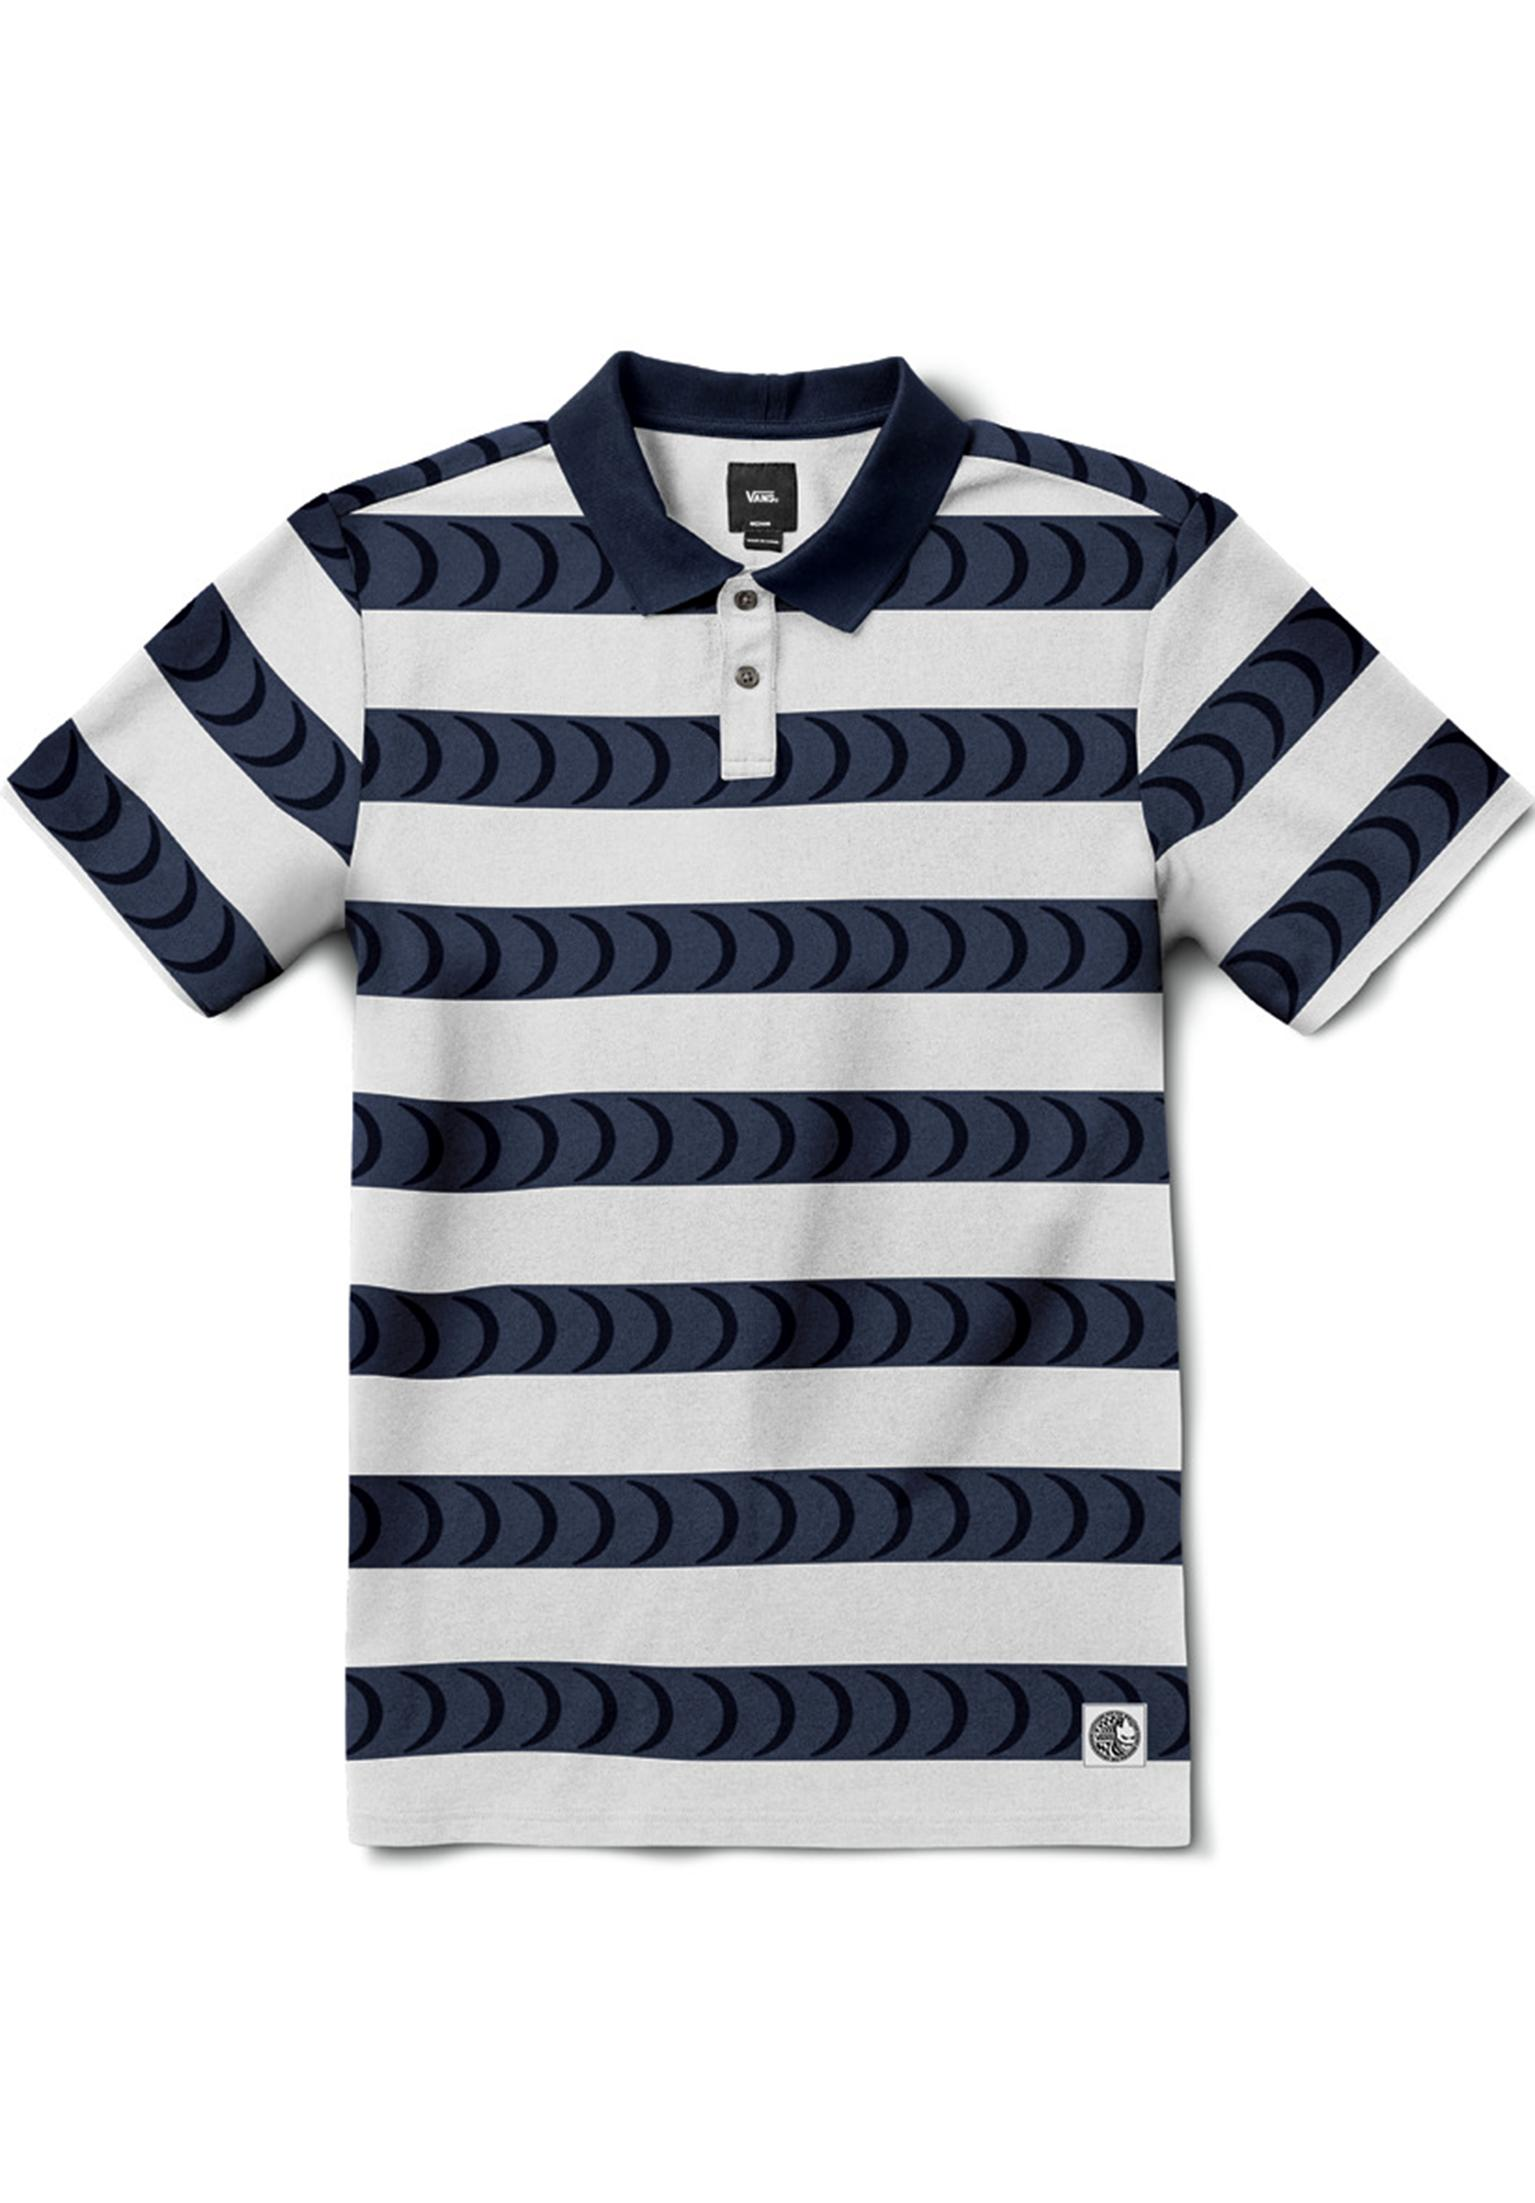 2875f38abd Vans x Spitfire Polo Vans Polo Shirts in white-dressblues for Men ...